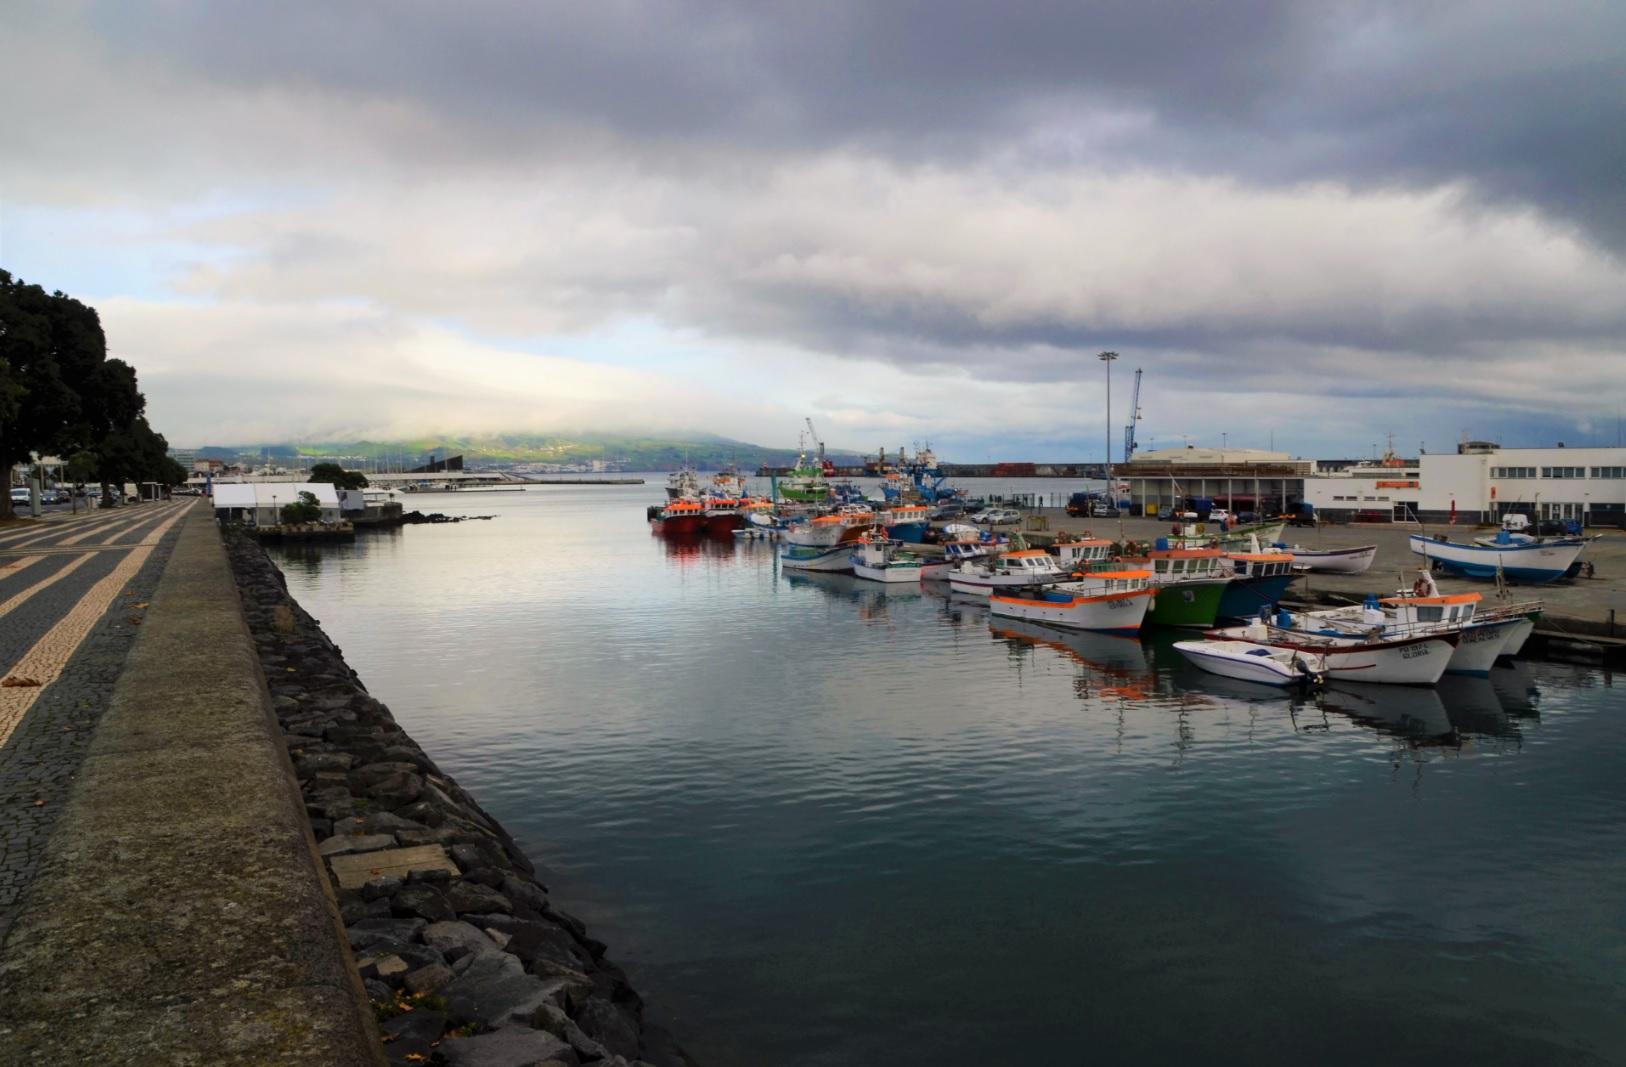 marina ponta delgada açores barcos mar